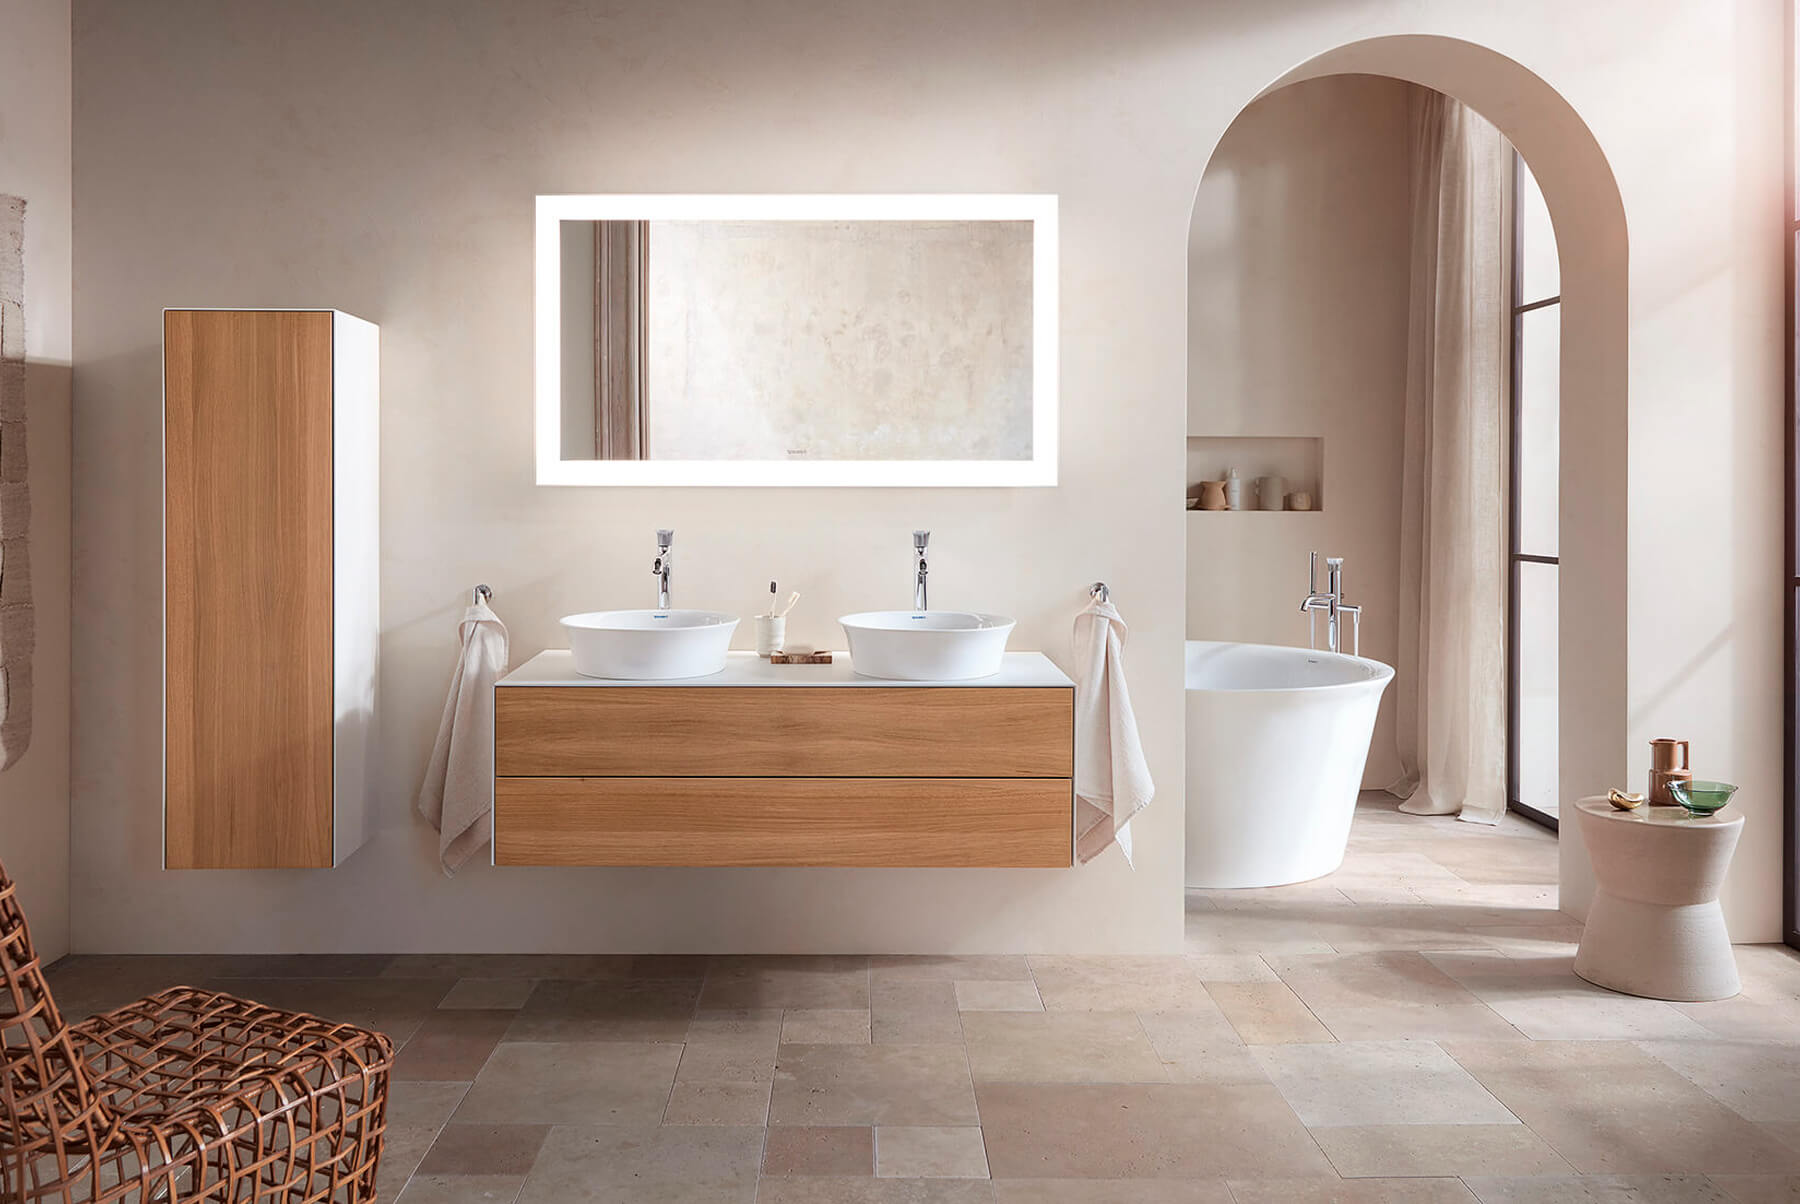 DURAVIT-White-Tulip-Basin-countertop-with-drawer-1800x1204